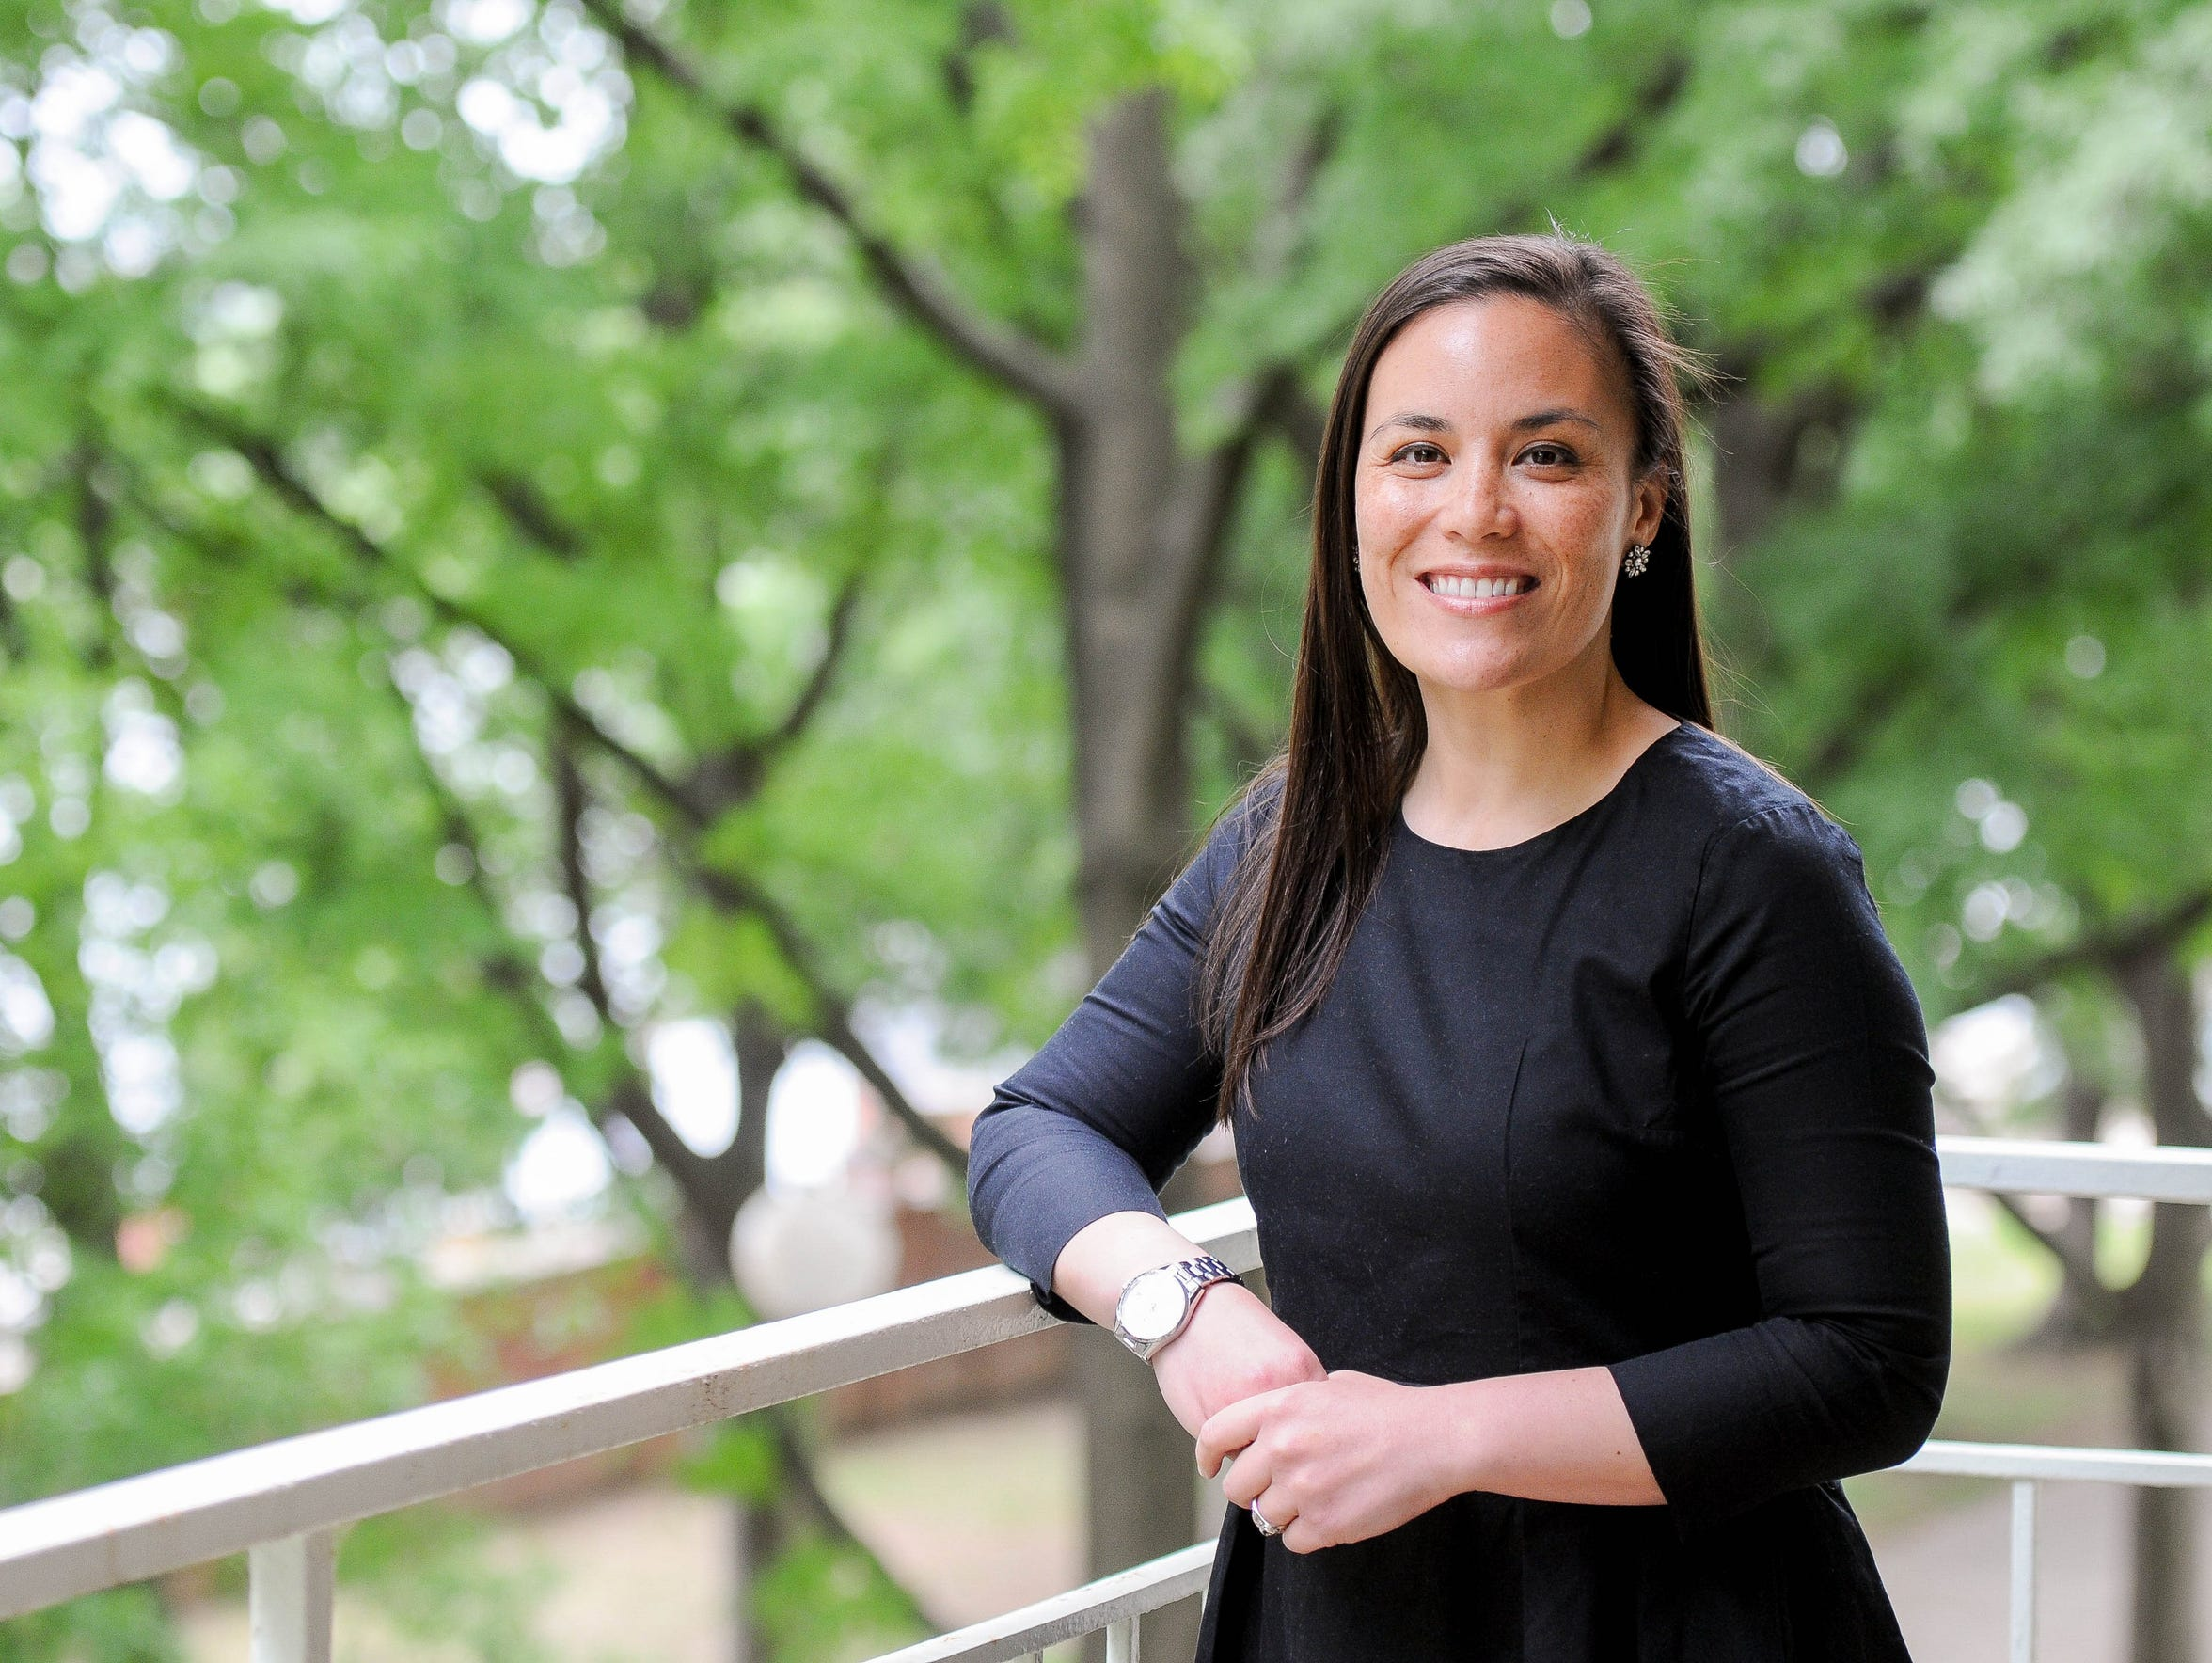 Gina Ortiz Jones, a former Air Force intelligence officer,